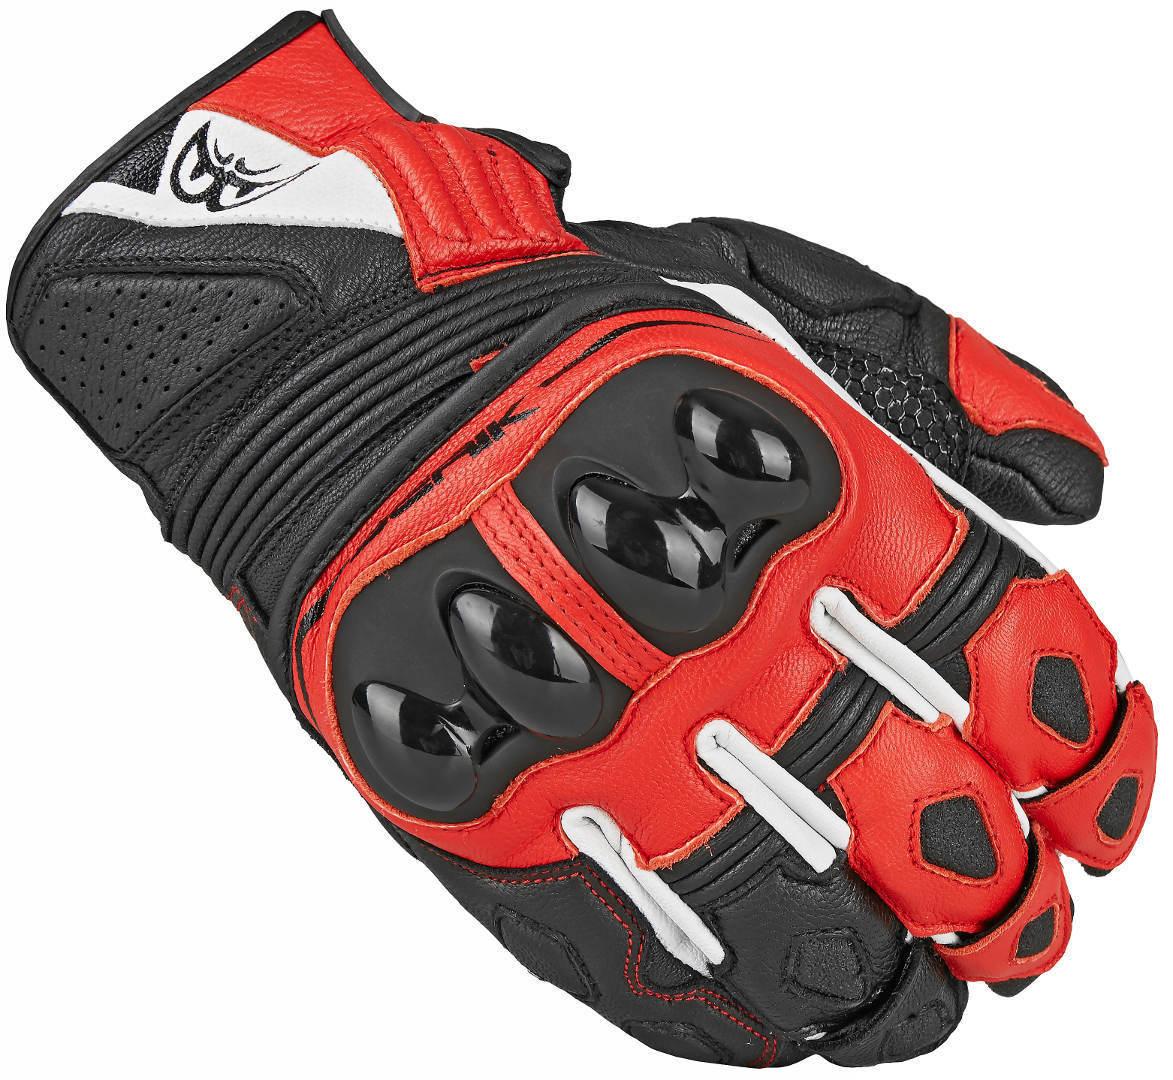 Berik Sprint Motorradhandschuhe, schwarz-rot, Größe S, schwarz-rot, Größe S